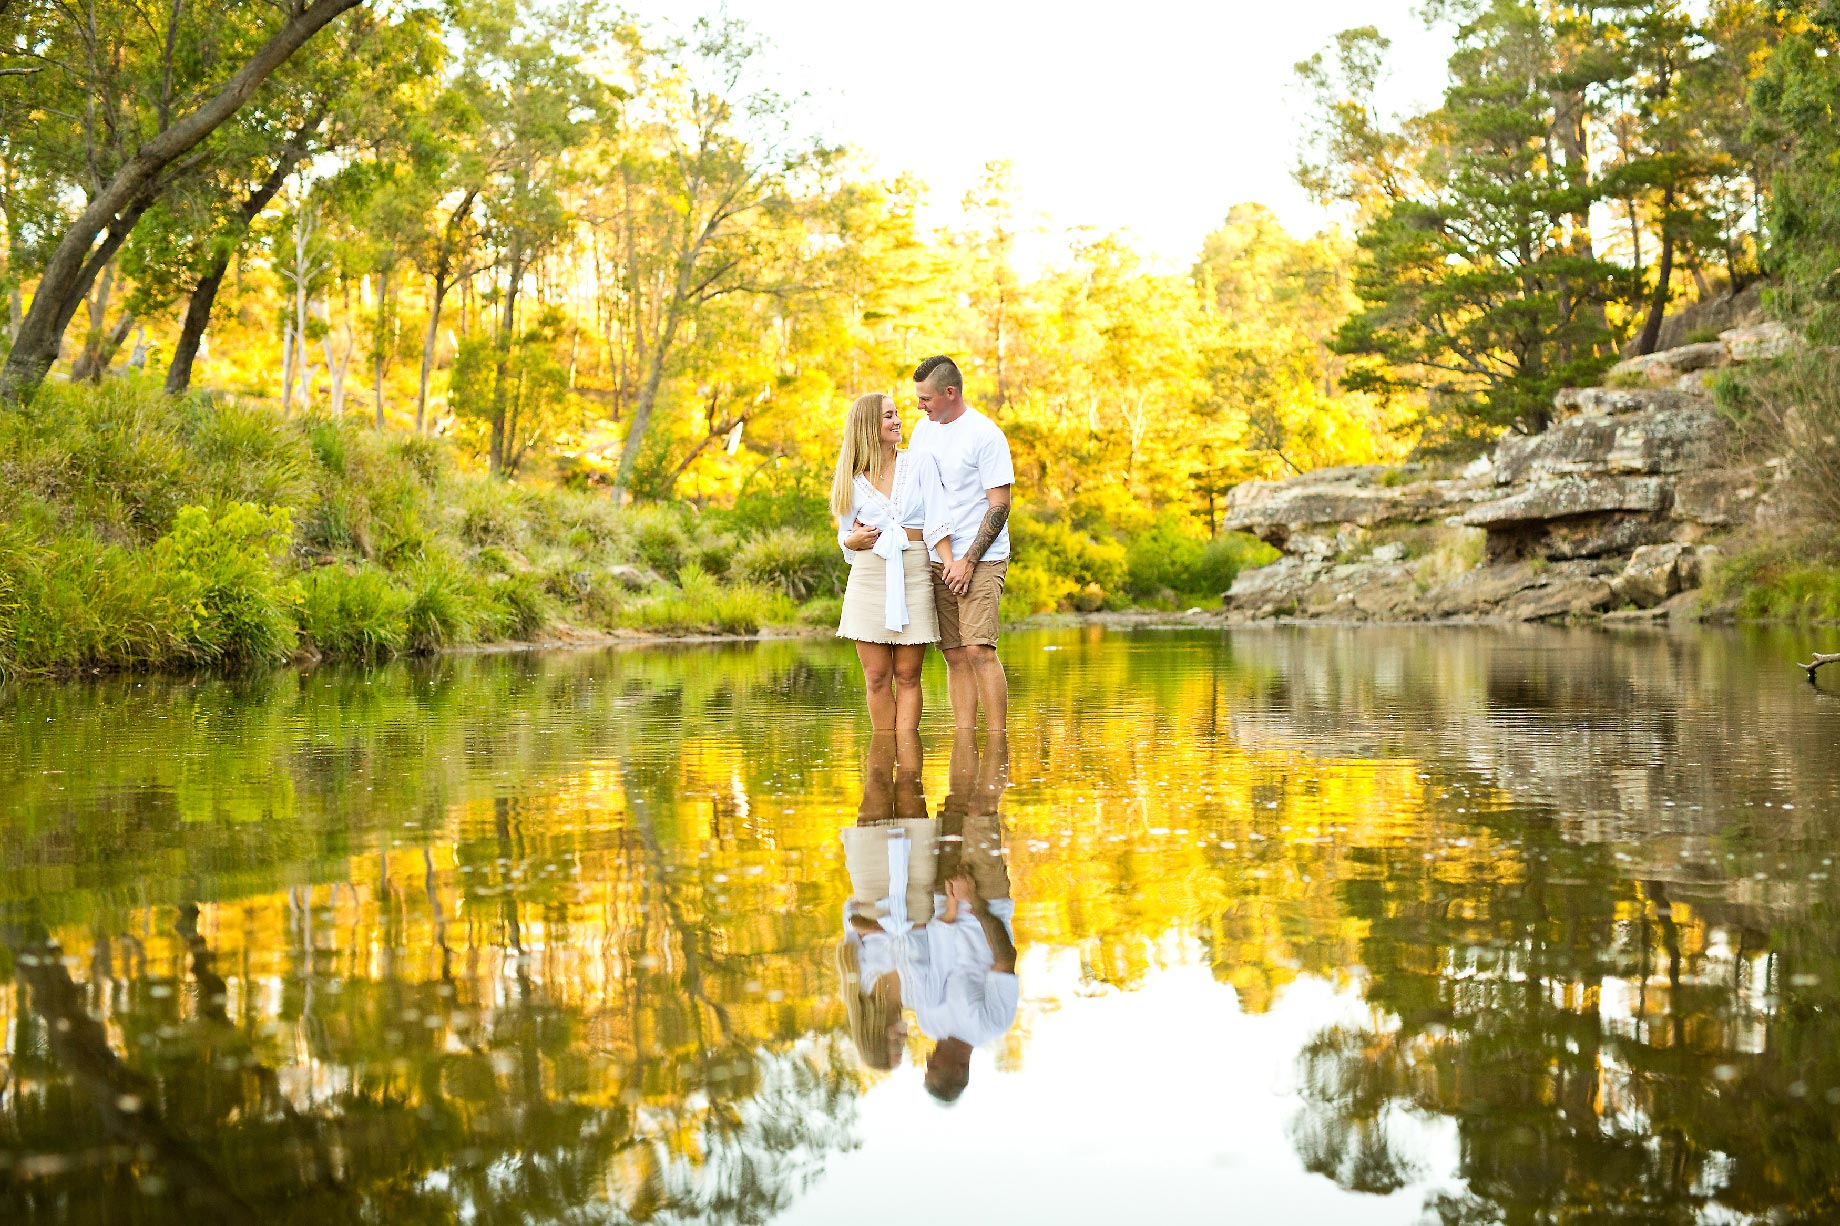 Rochelle Tim engagement photo session Berrima river